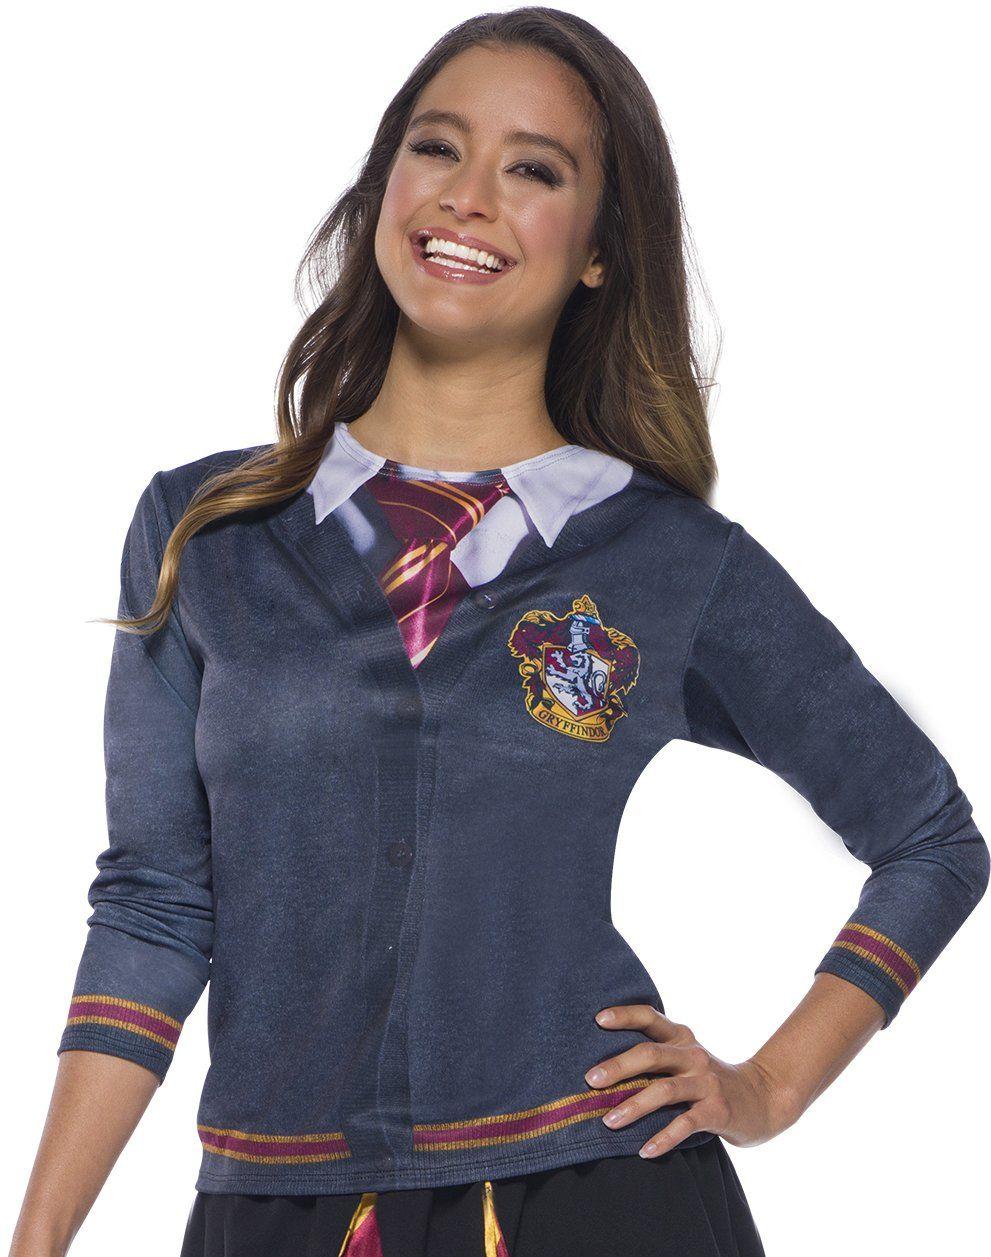 Rubie''s 821144_L-000-L oficjalna damska część kostiumowa Harry Potter, 821144, Gryffindor, L